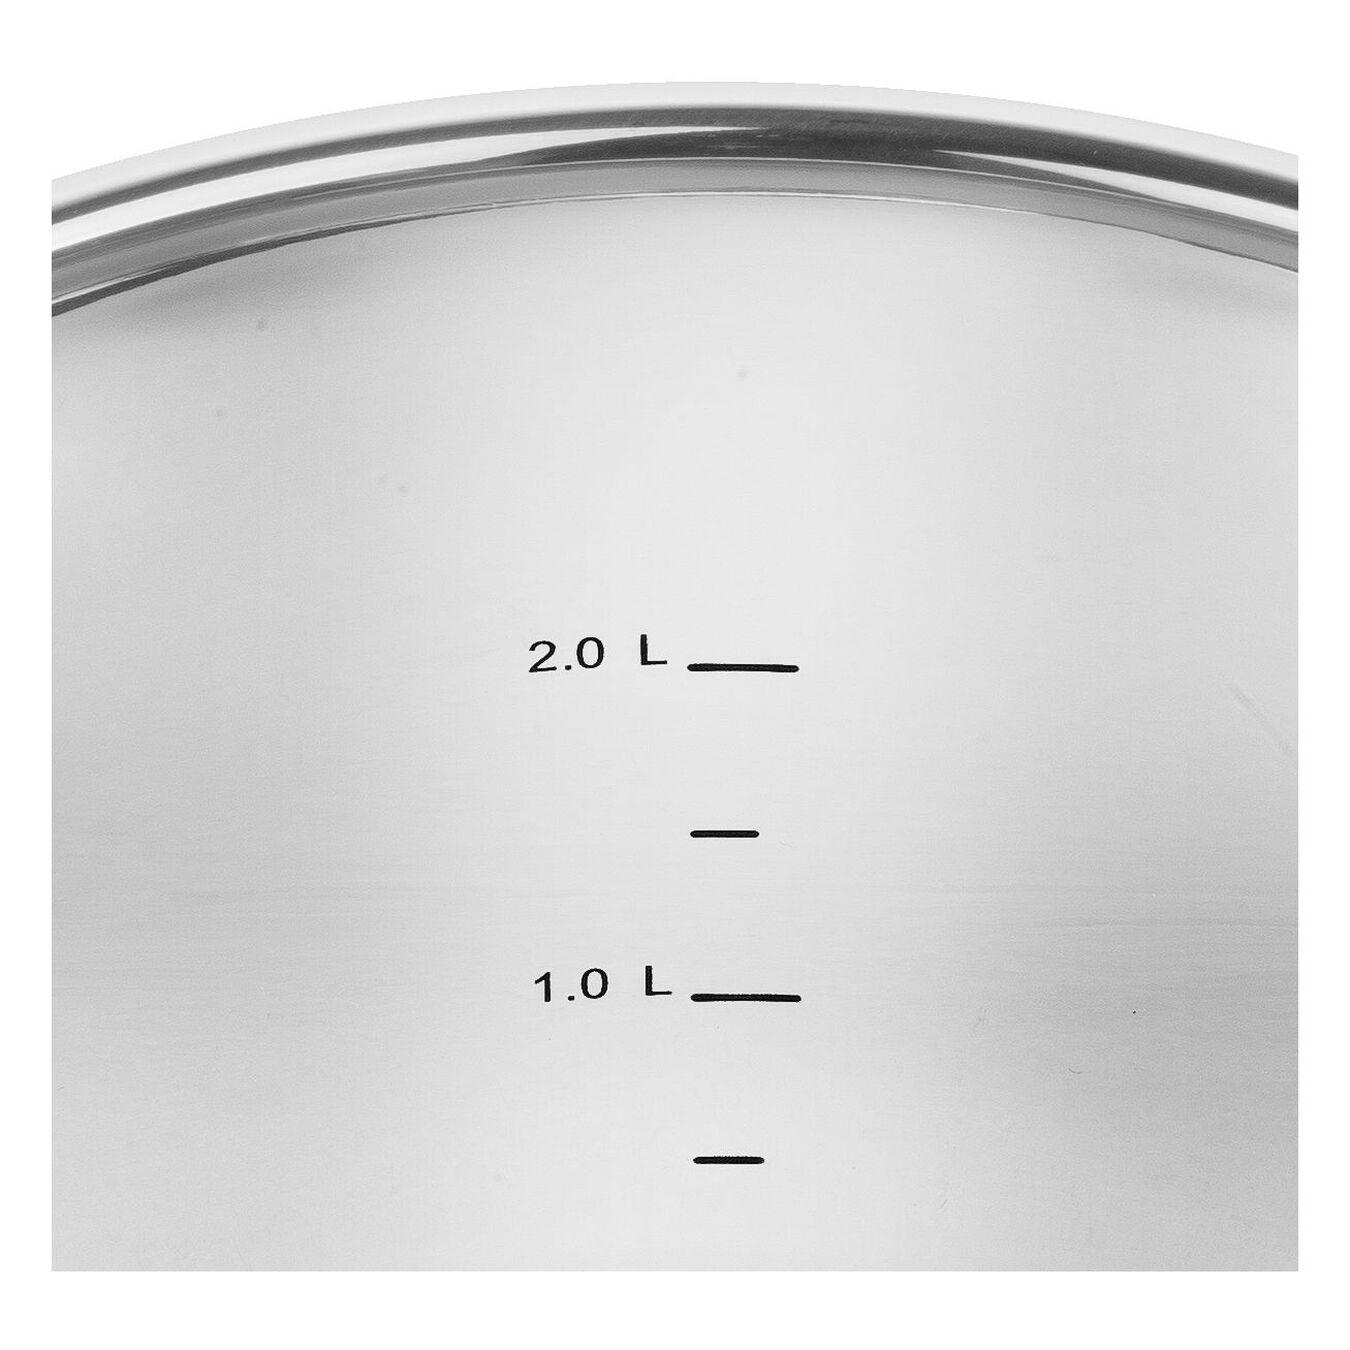 5 Piece Cookware set,,large 3